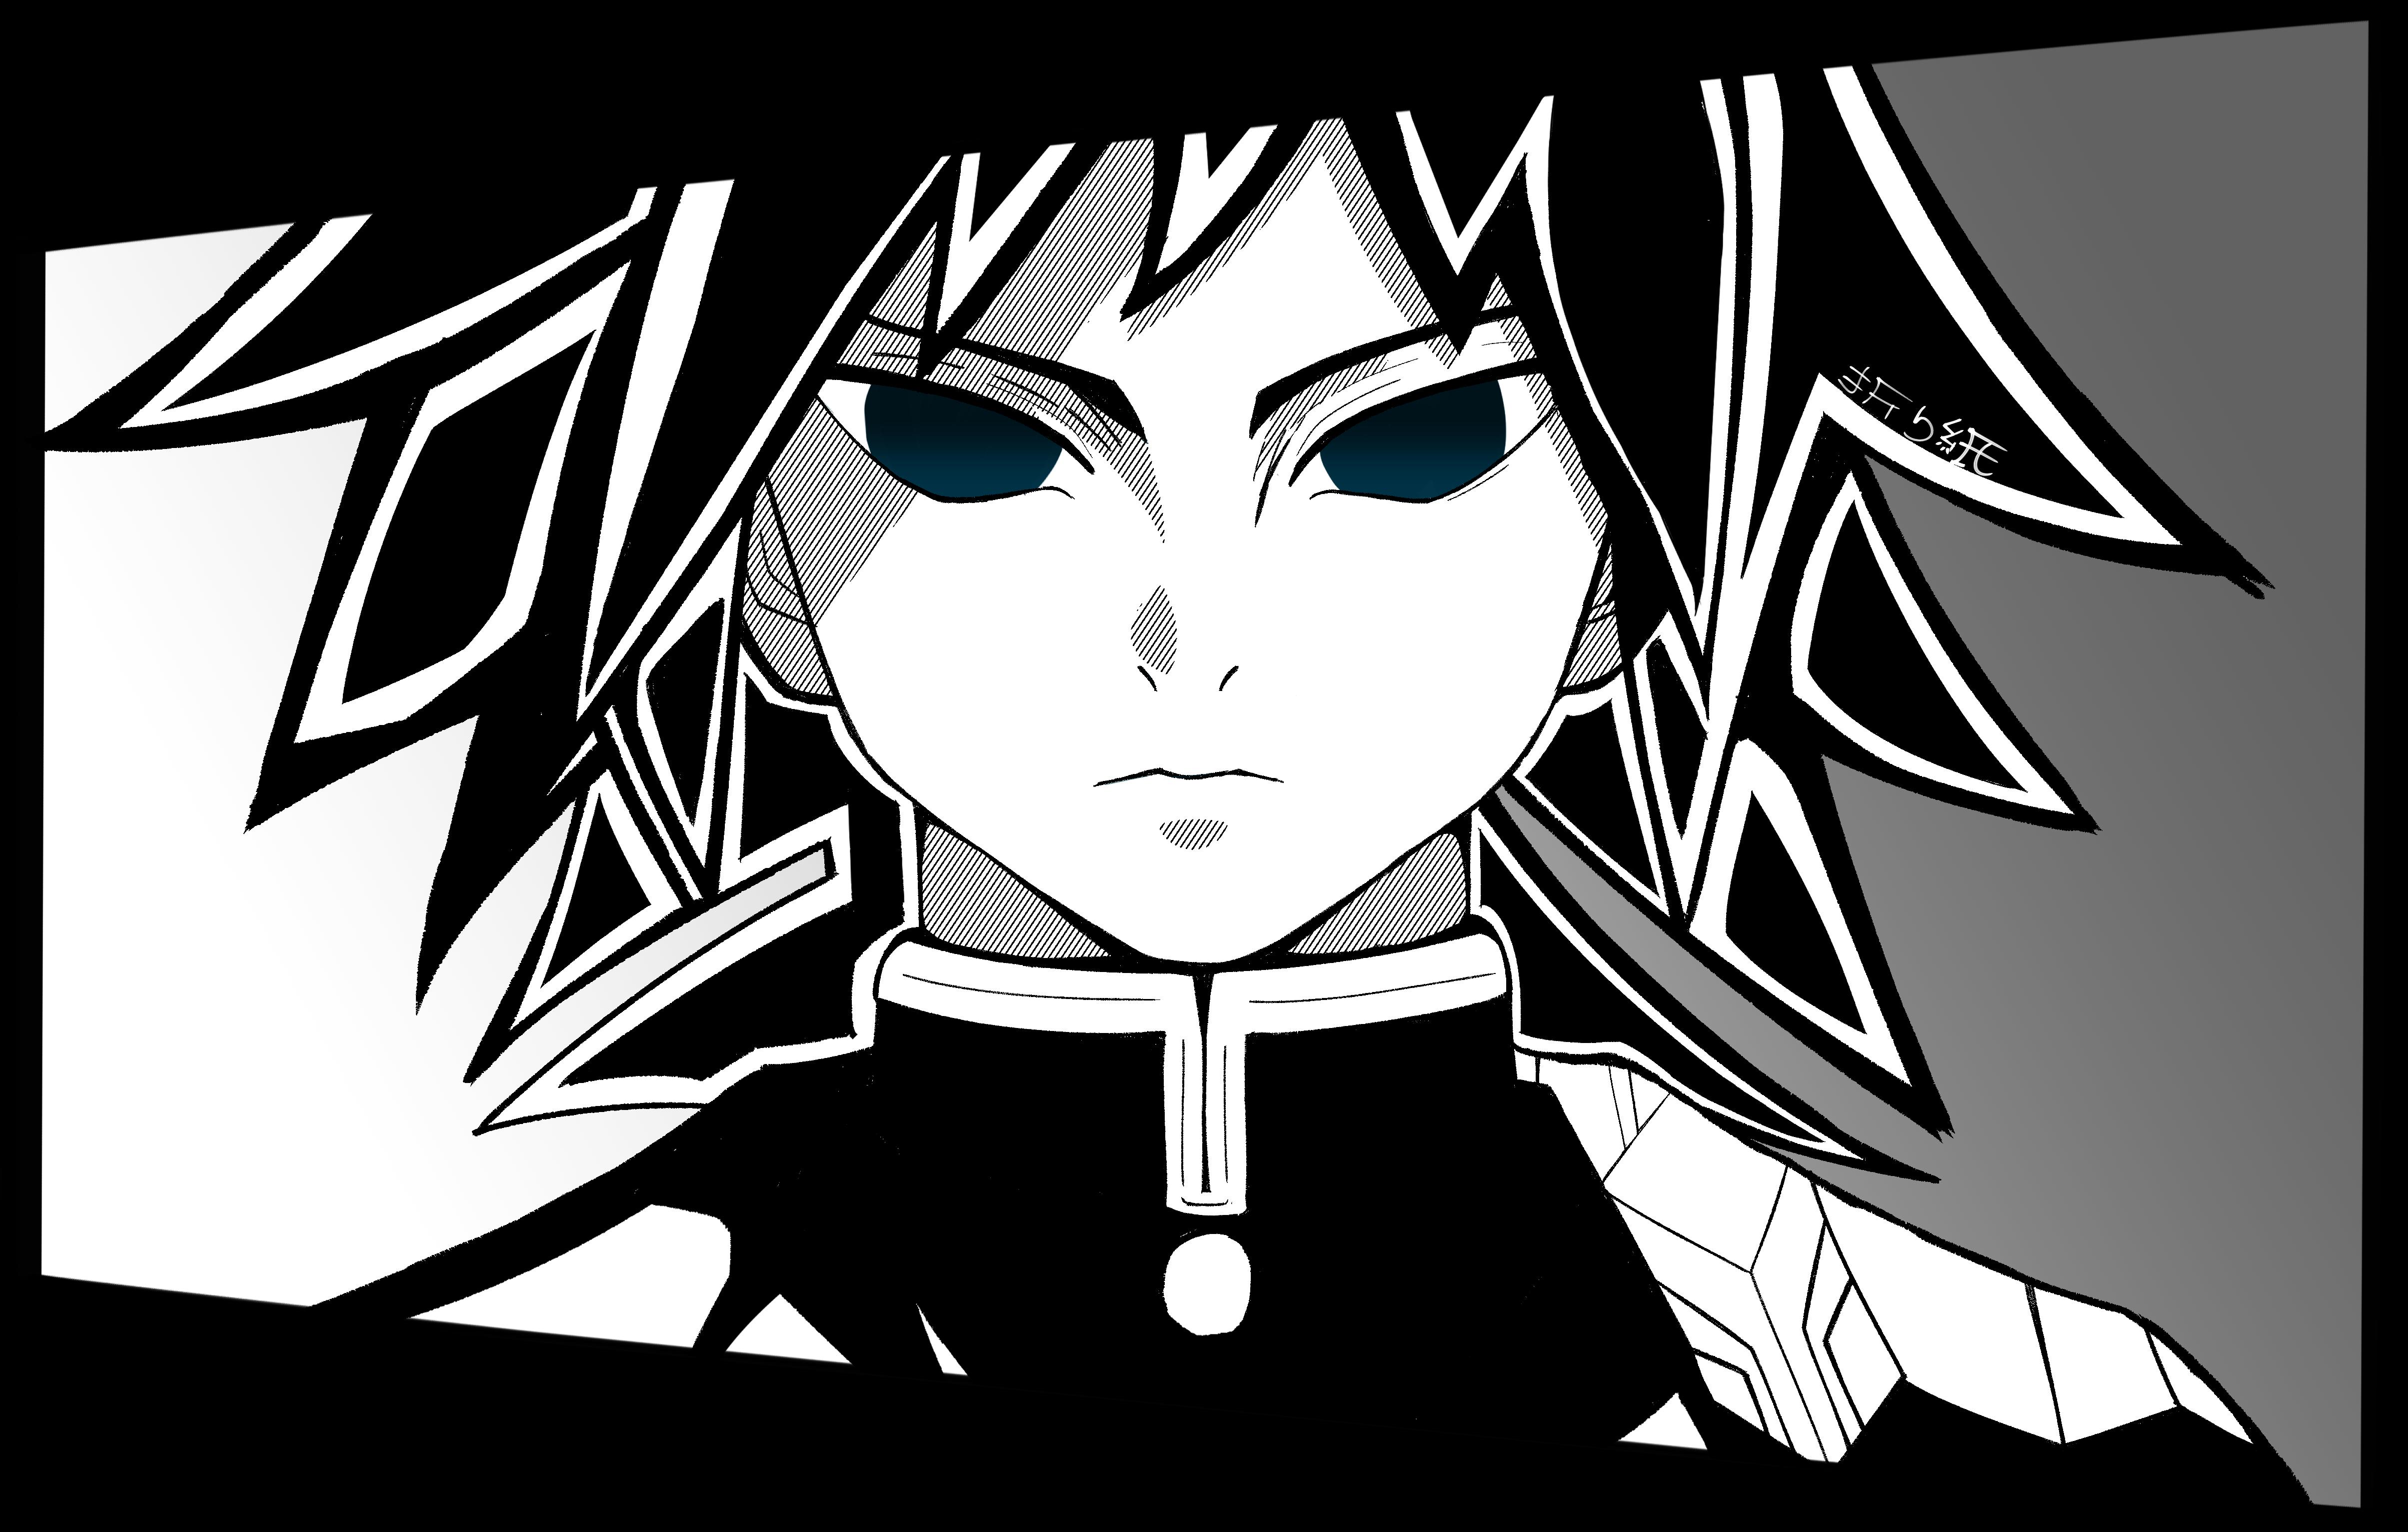 Demon Slayer: Kimetsu no Yaiba 4k Ultra HD Wallpaper | Background Image | 4817x3064 | ID:1037291 ...